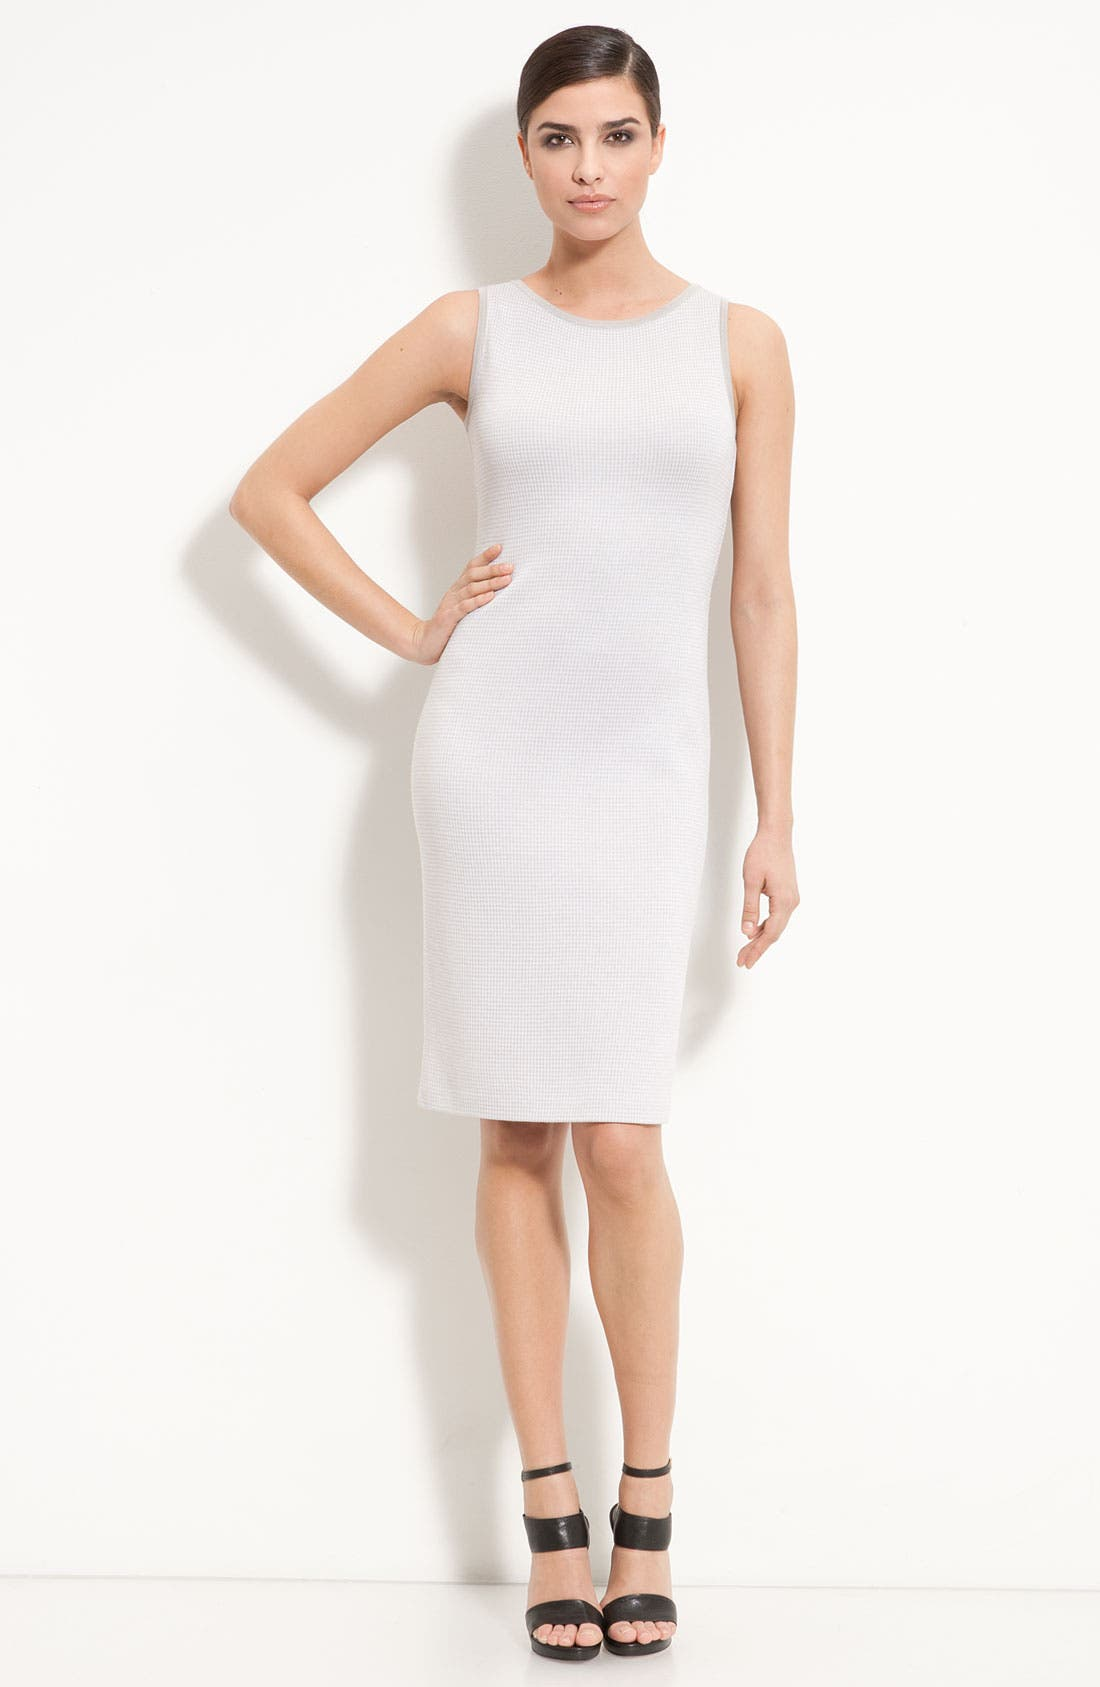 Alternate Image 1 Selected - St. John Collection Sleeveless Knit Sheath Dress